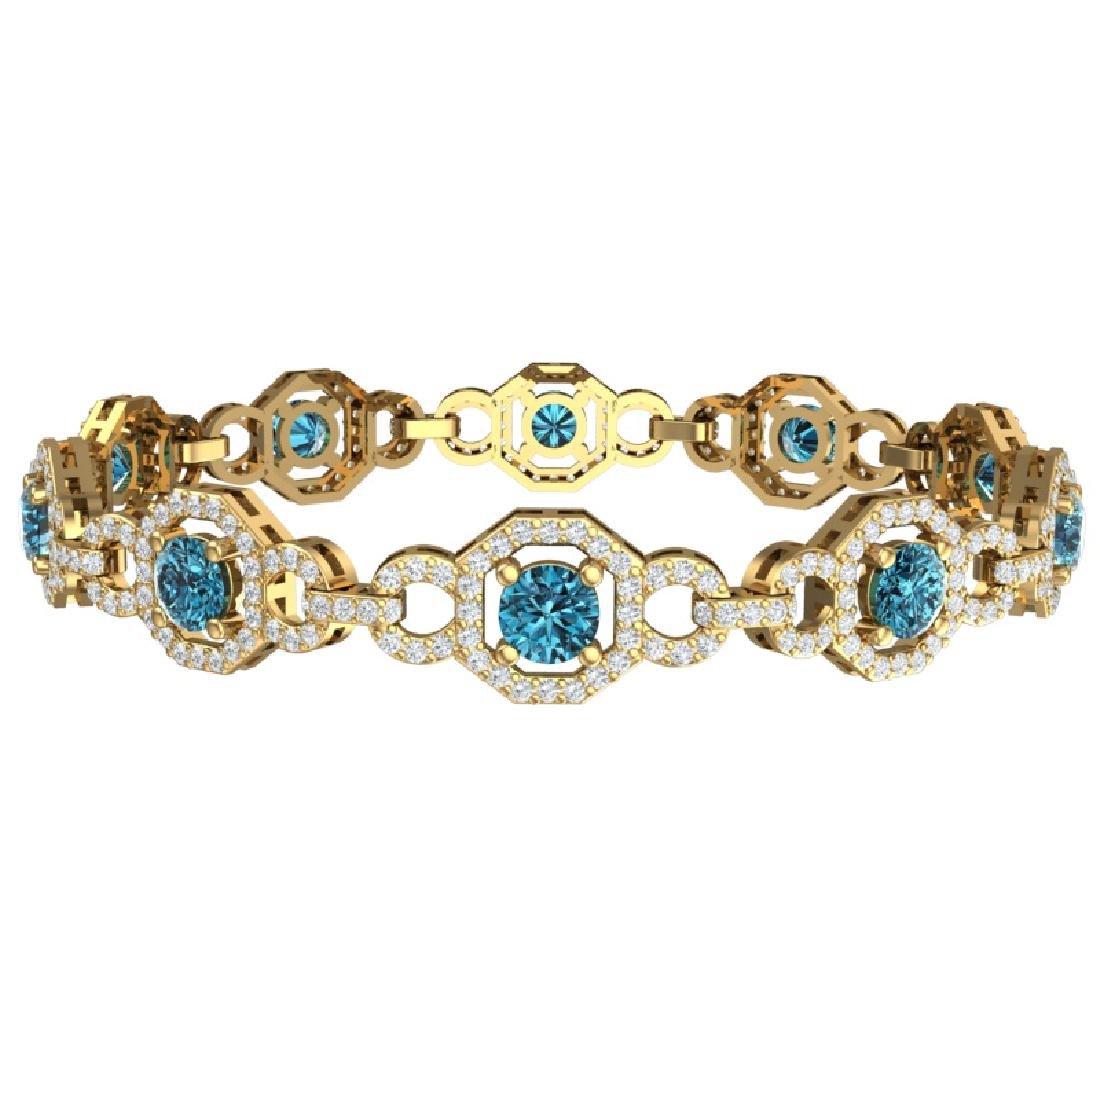 12 CTW SI/I Intense Blue And White Diamond Bracelet 18K - 3